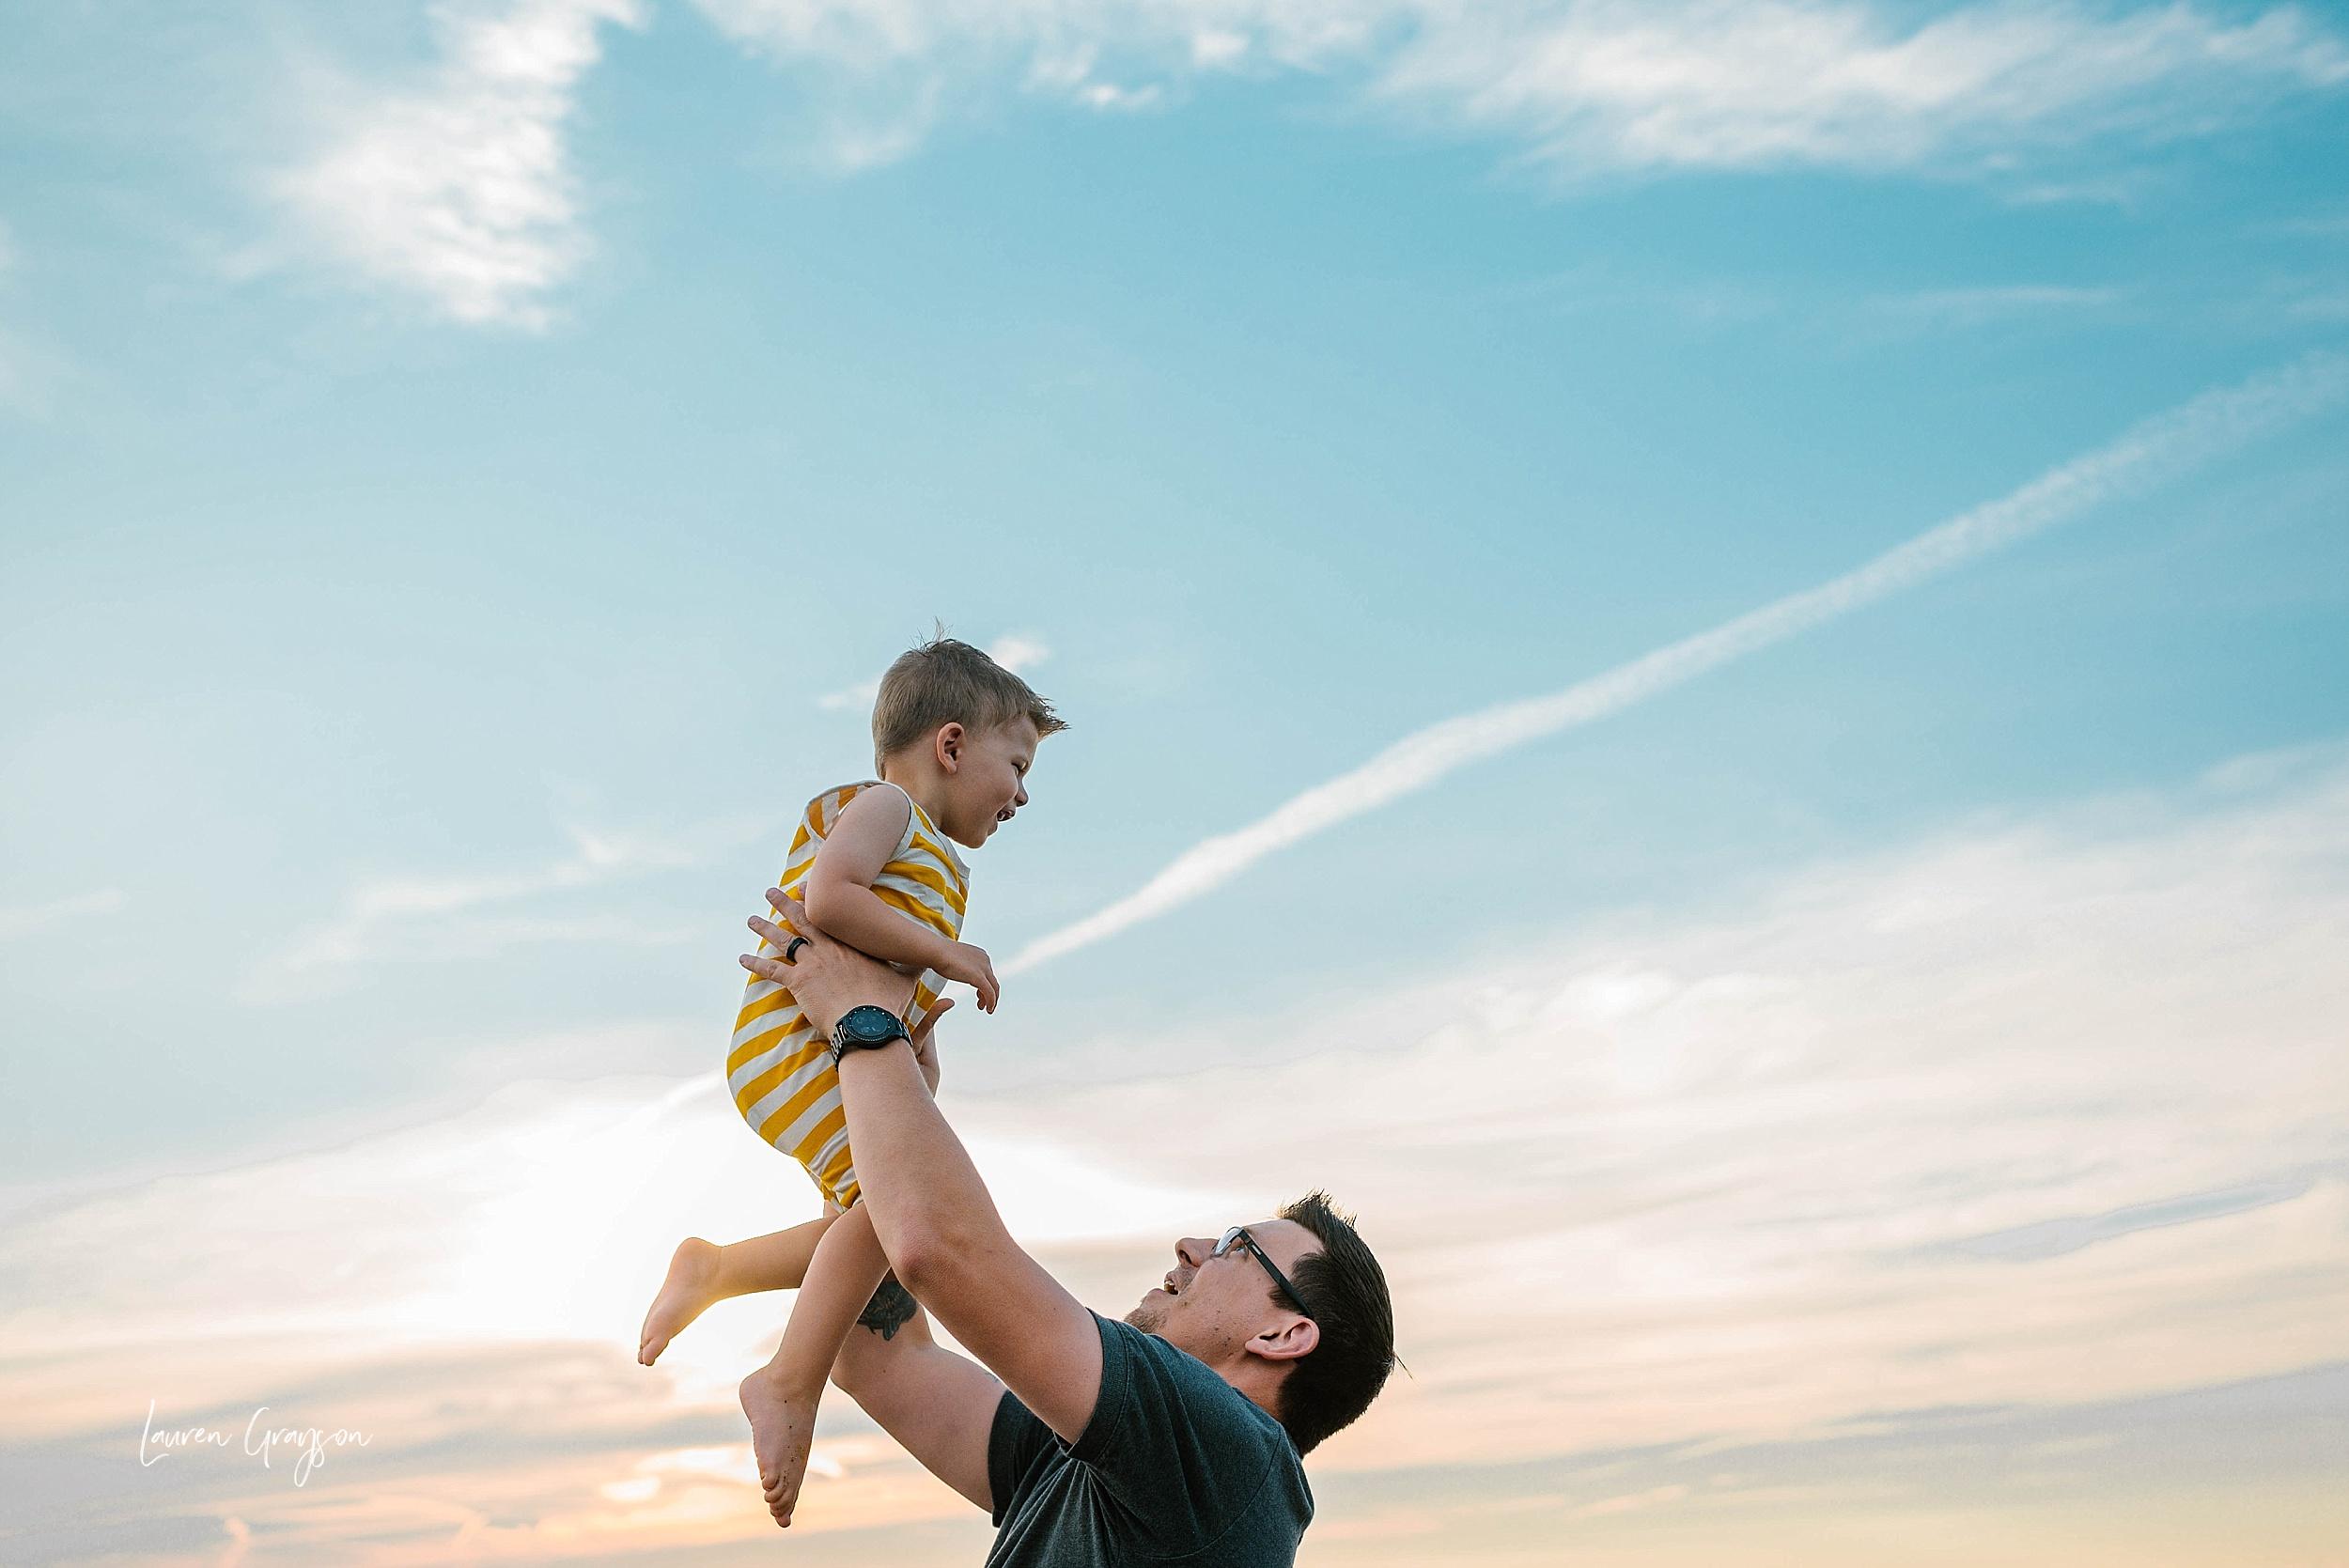 lauren-grayson-photography-cleveland-ohio-photographer-mentor-headlands-beach-maternity-session-2018_0769.jpg